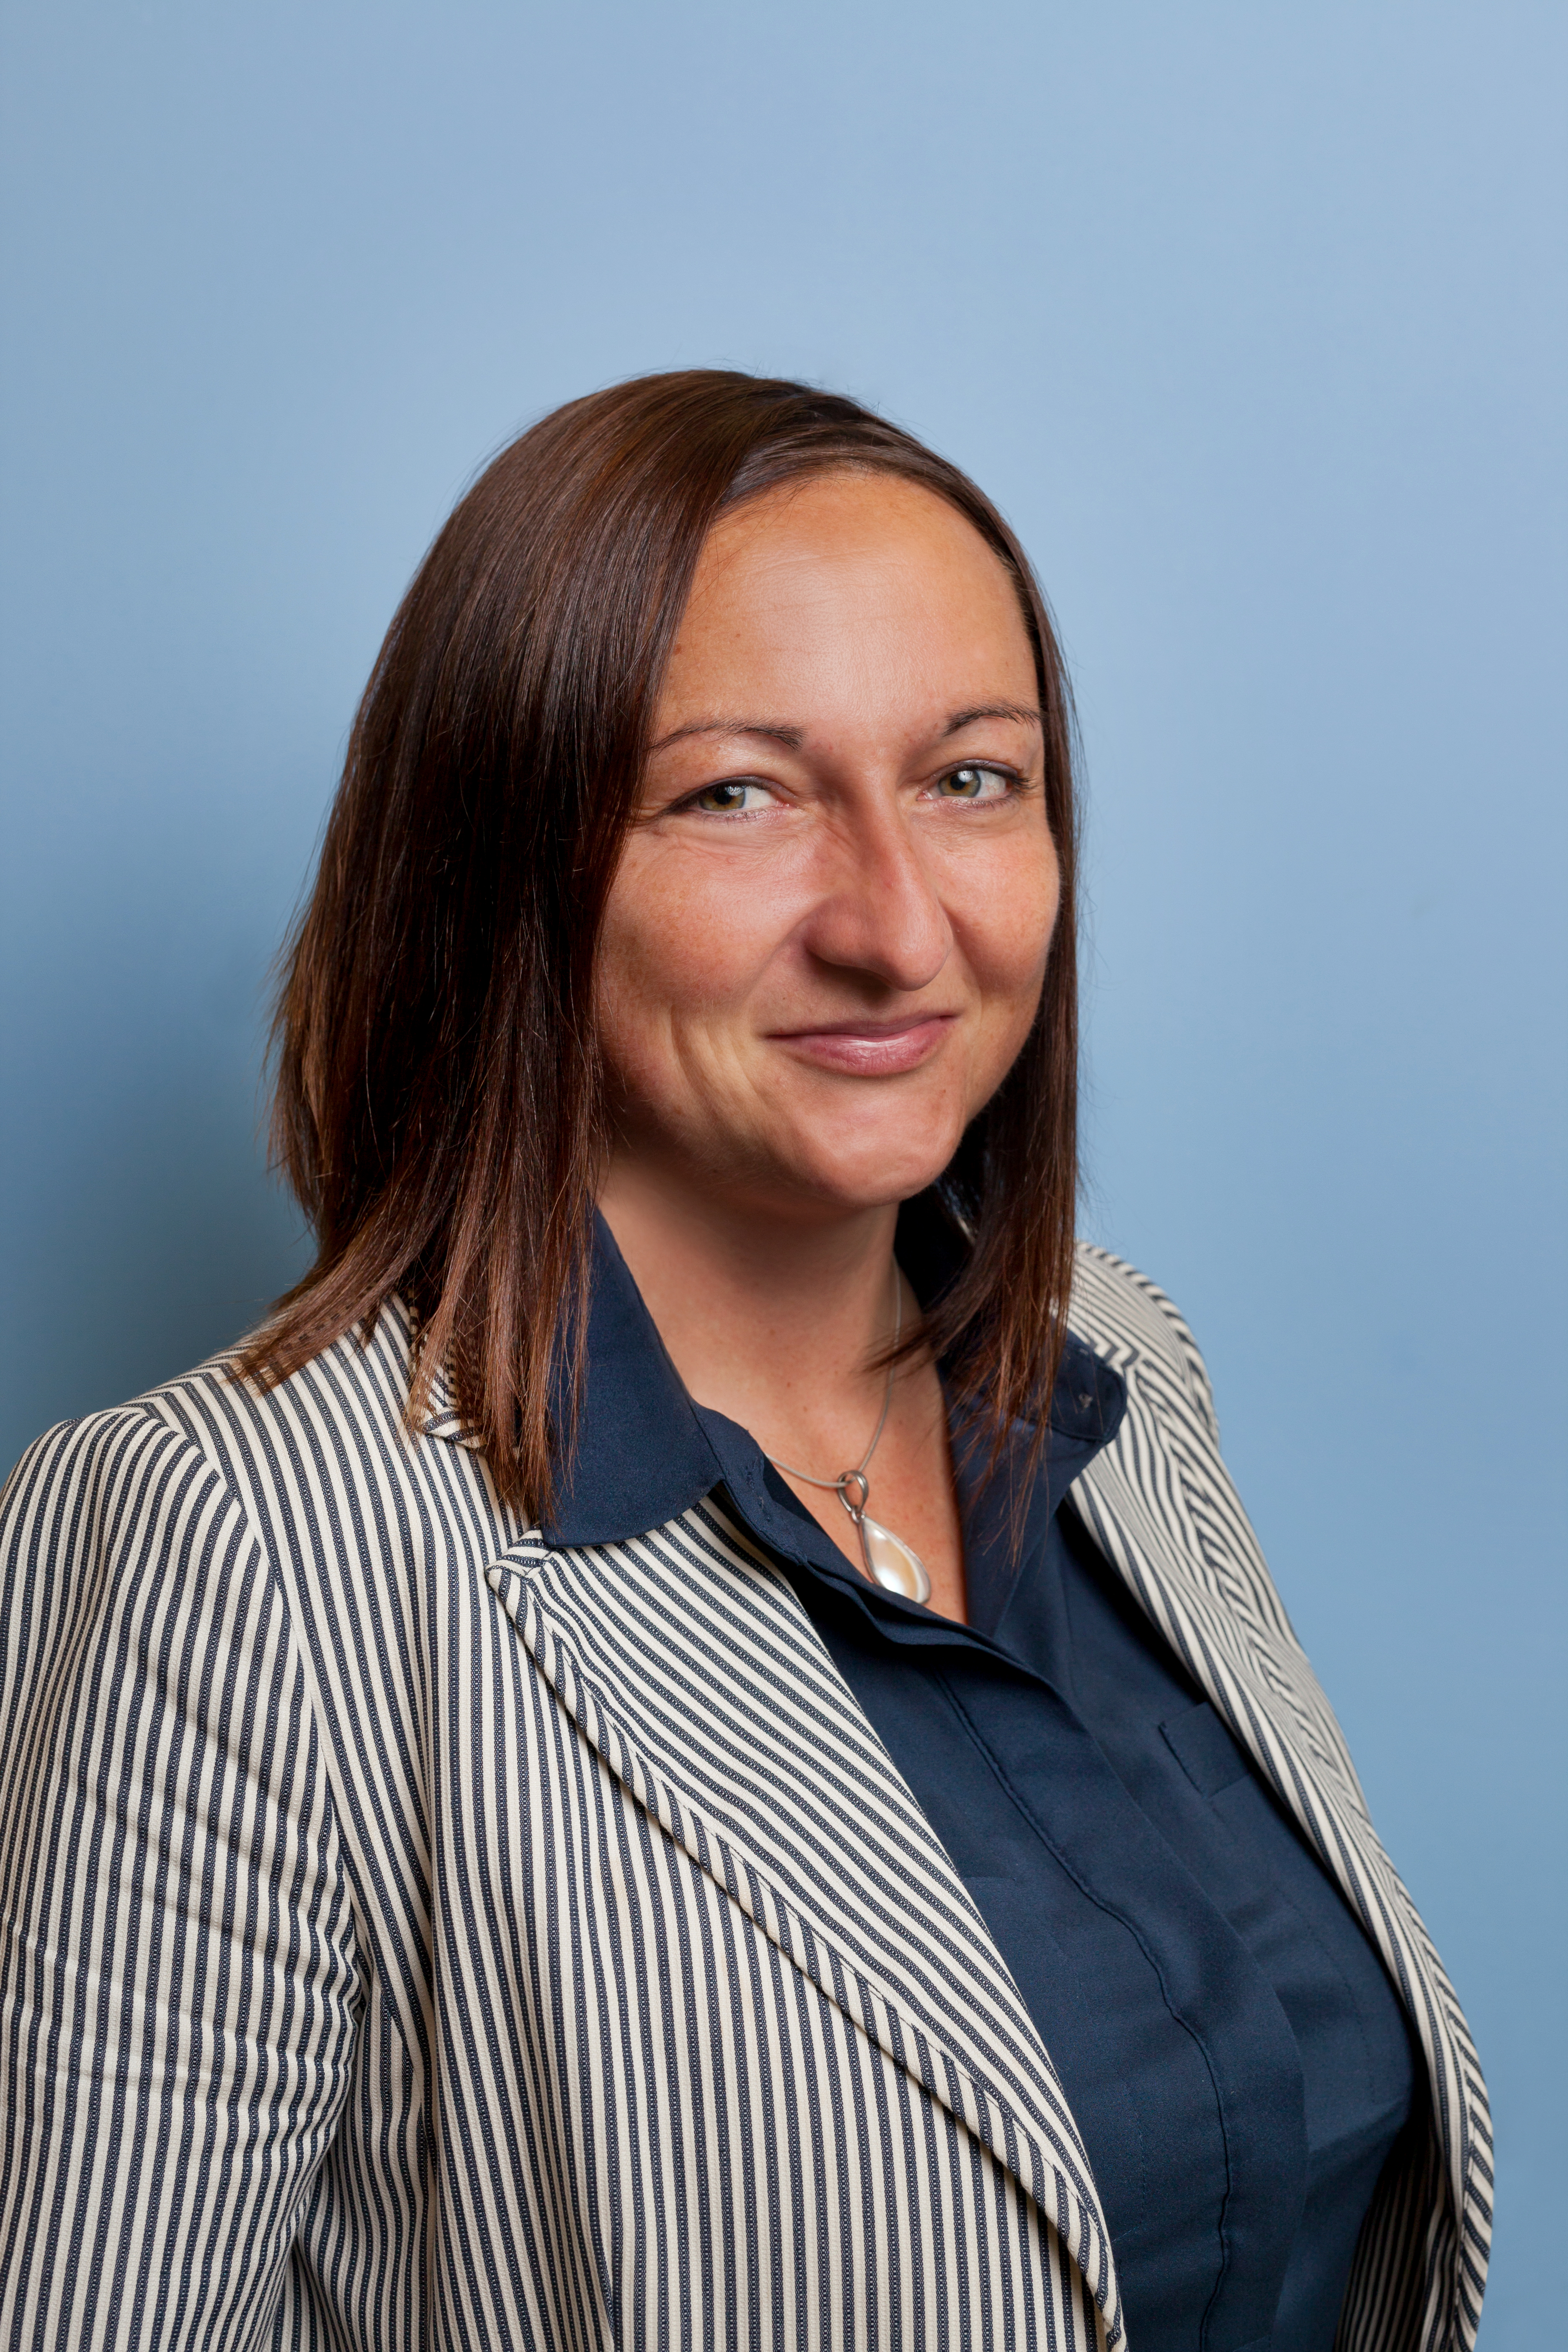 Caroline Flammer of Boston University's Questrom School of Business.